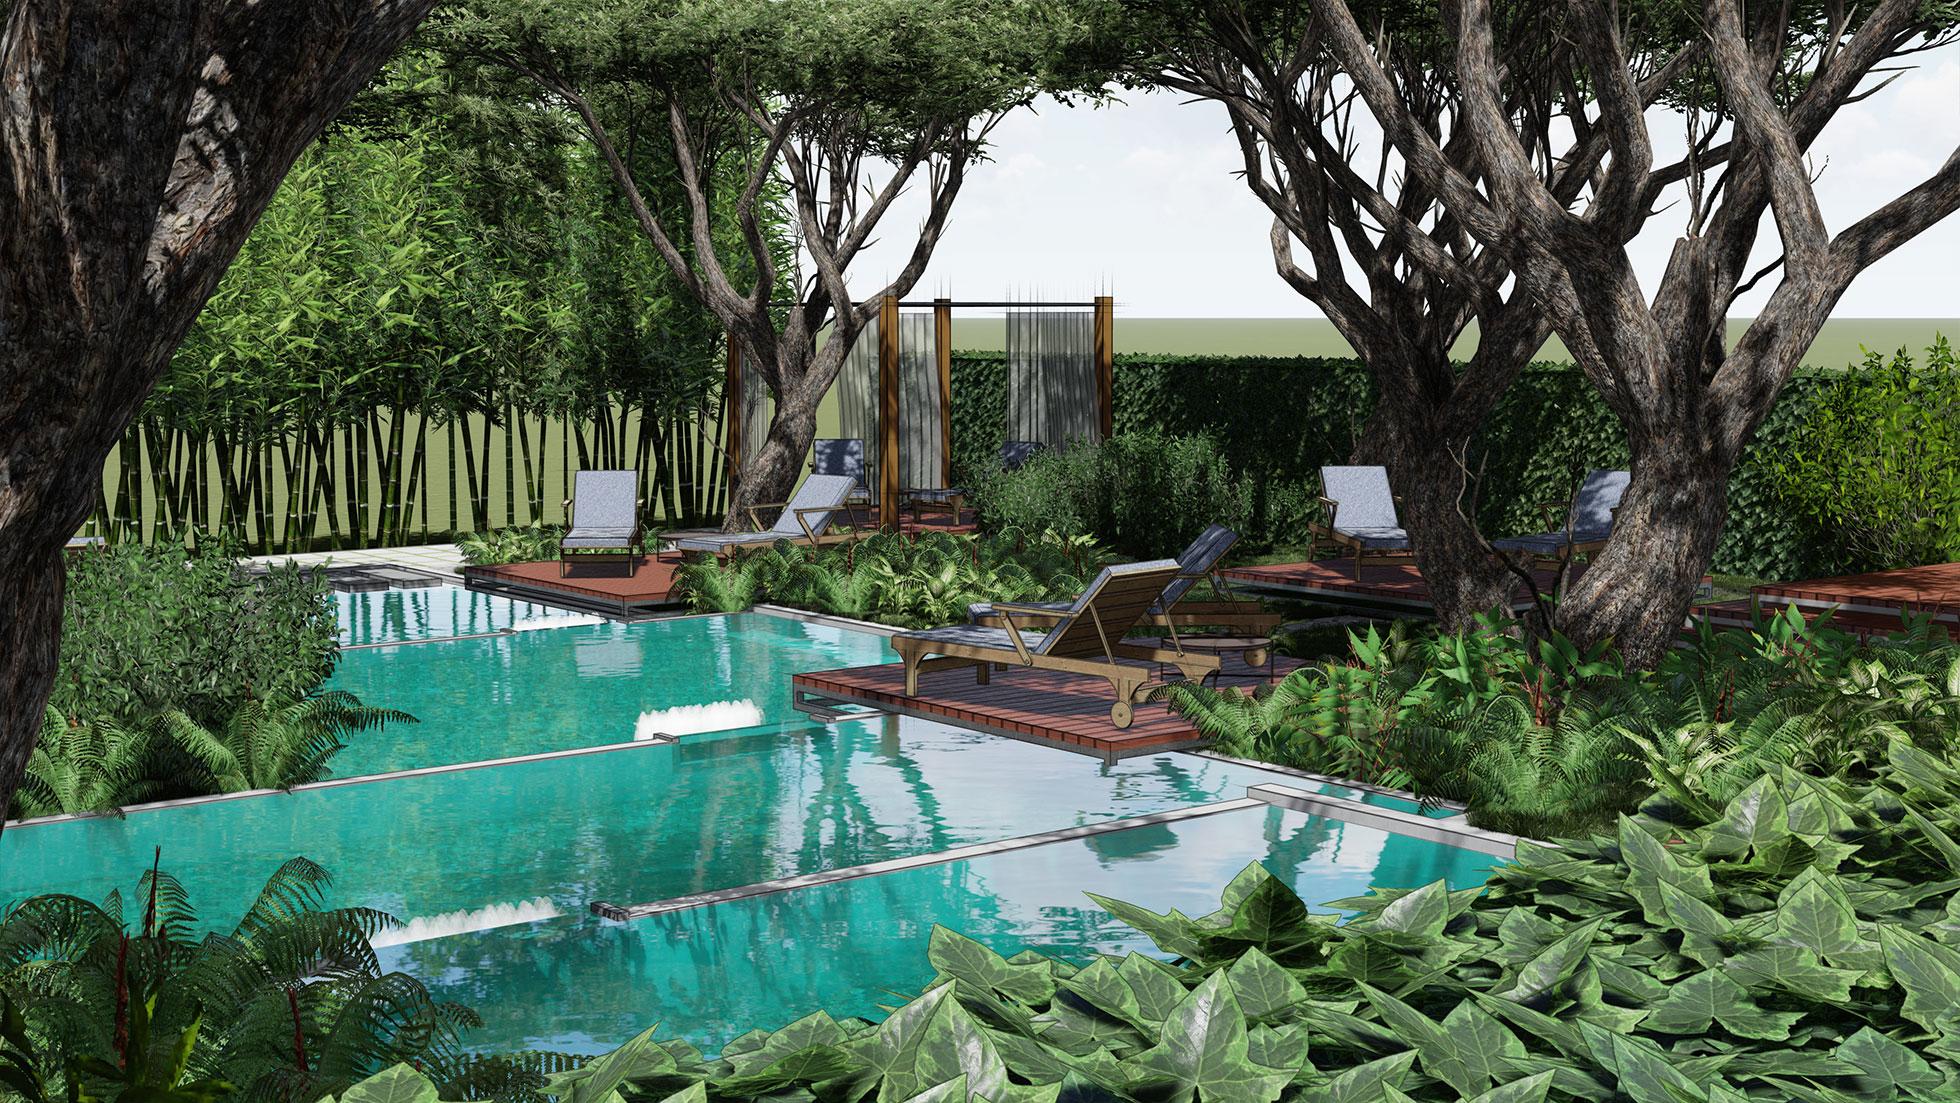 Krajobrazna arhitektura, landscape architecture, garden design, wellness garden, opop studio, željko radišić